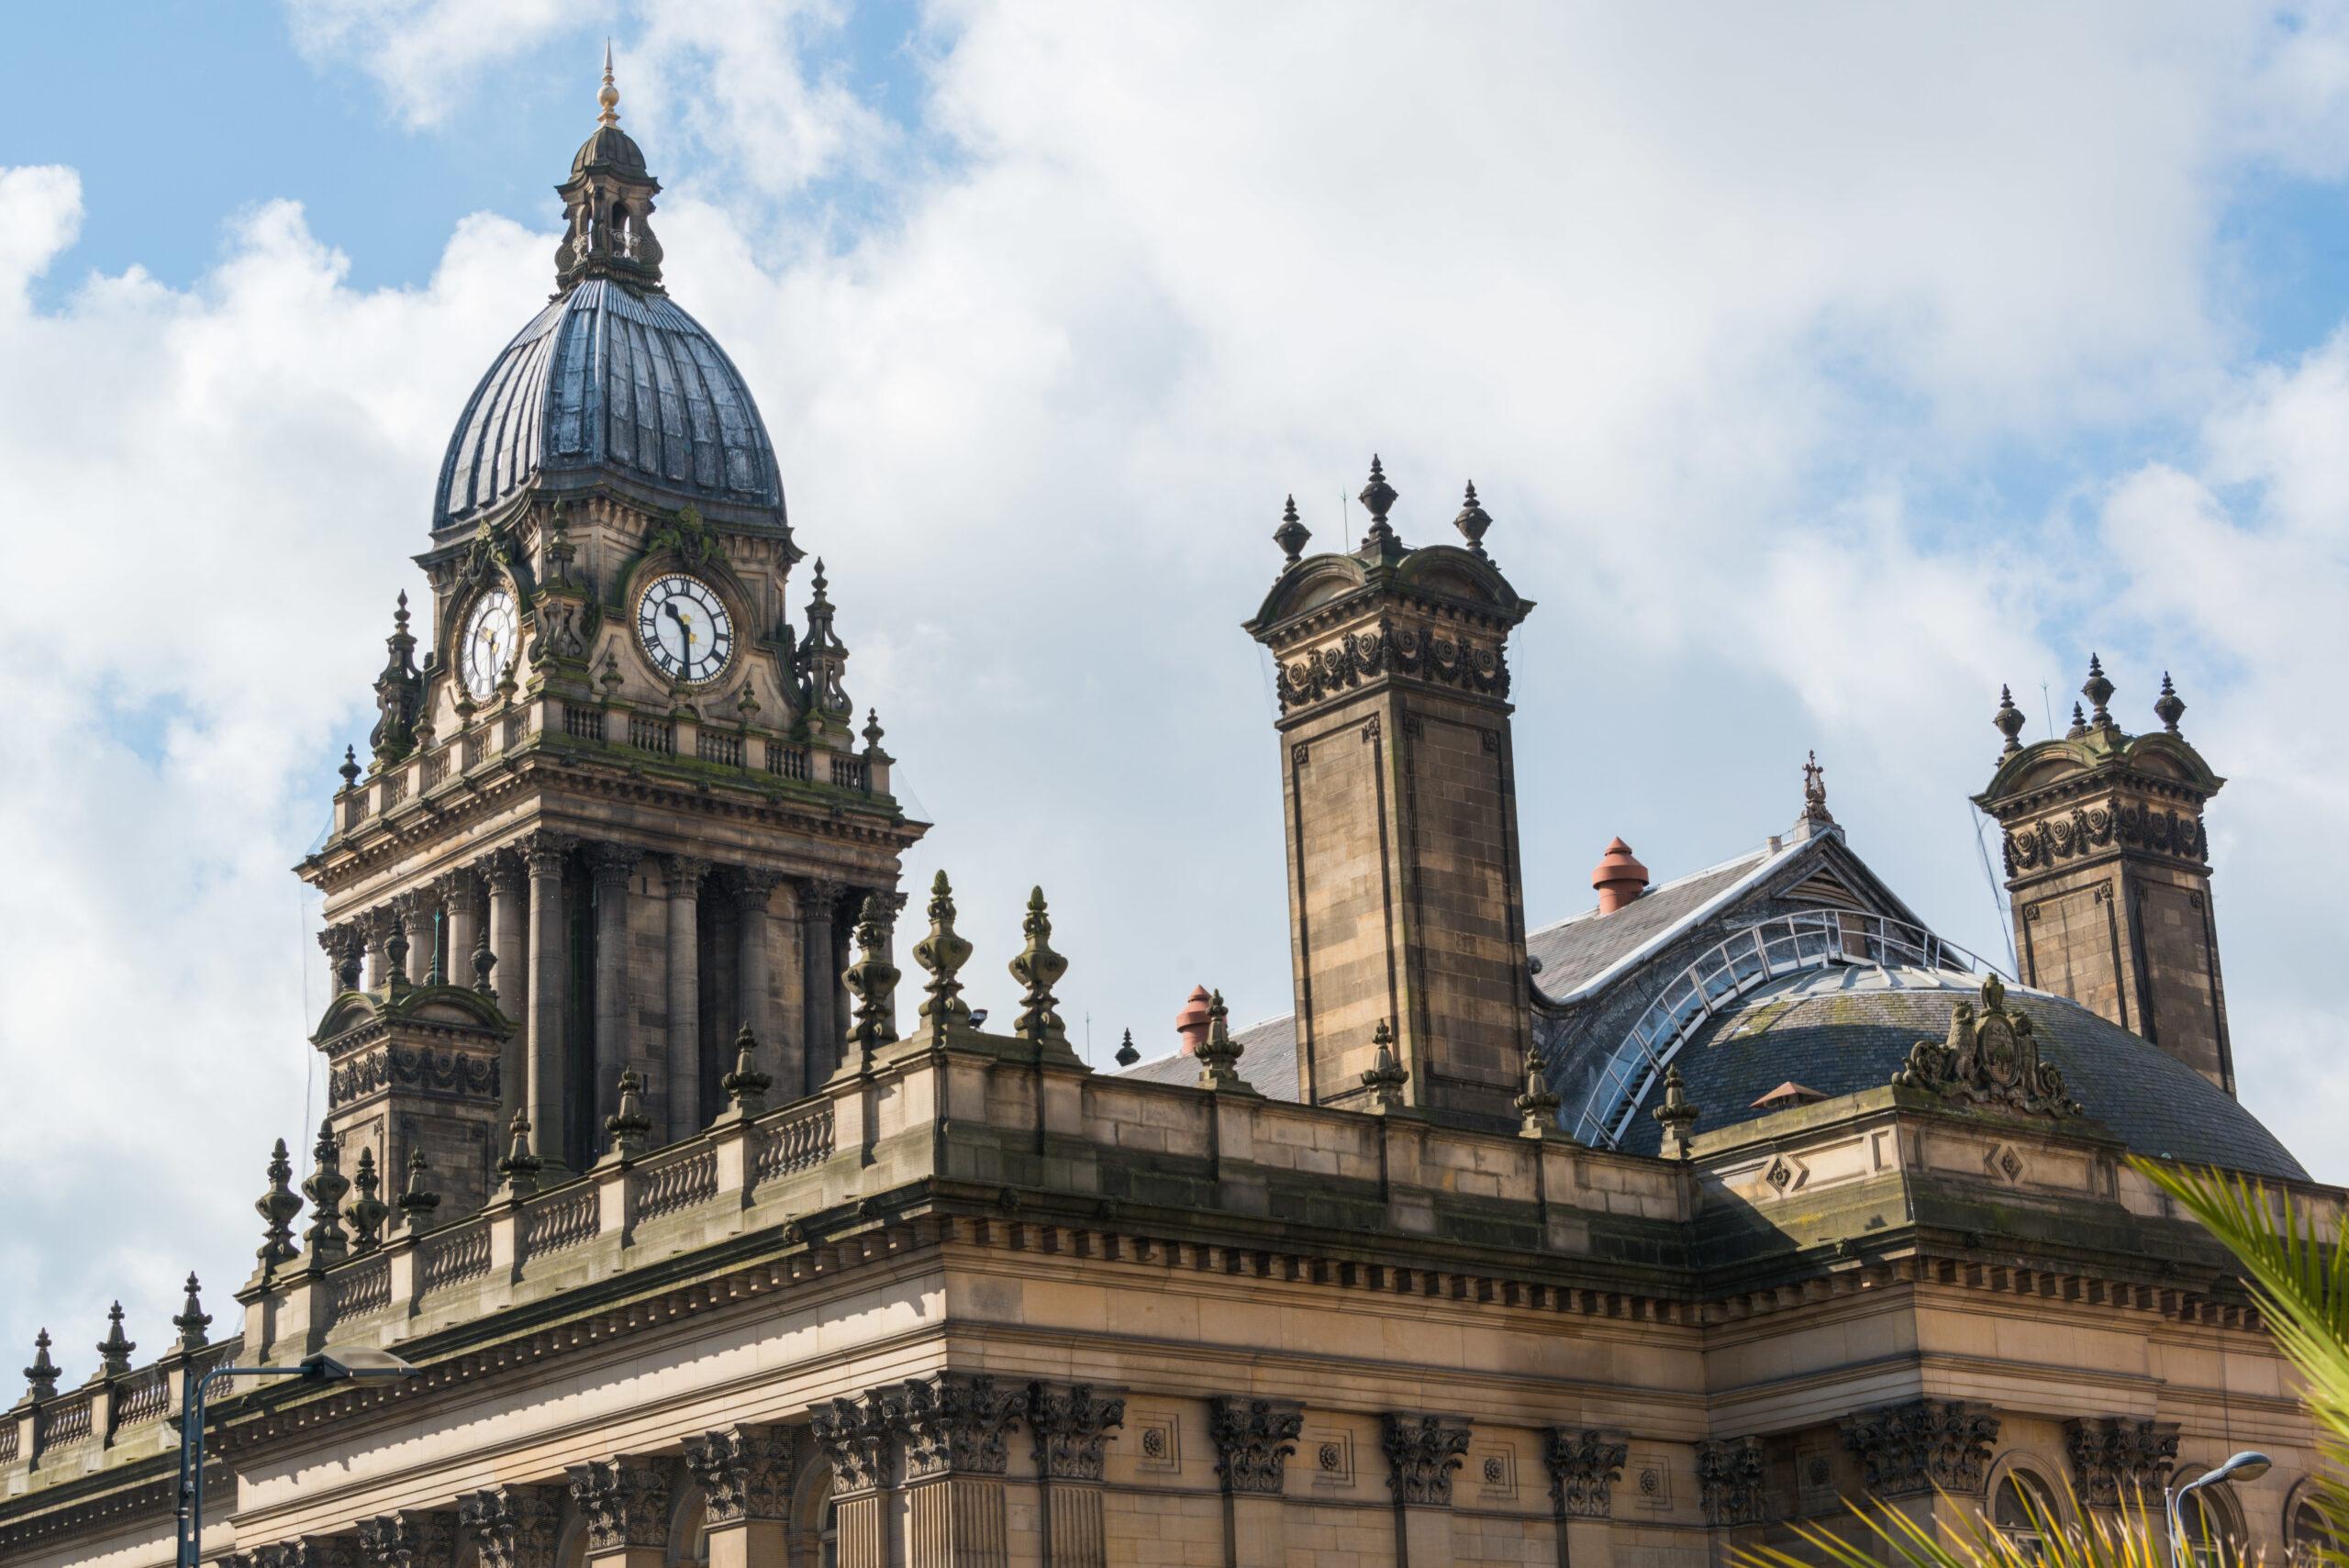 The Town Hall, Leeds